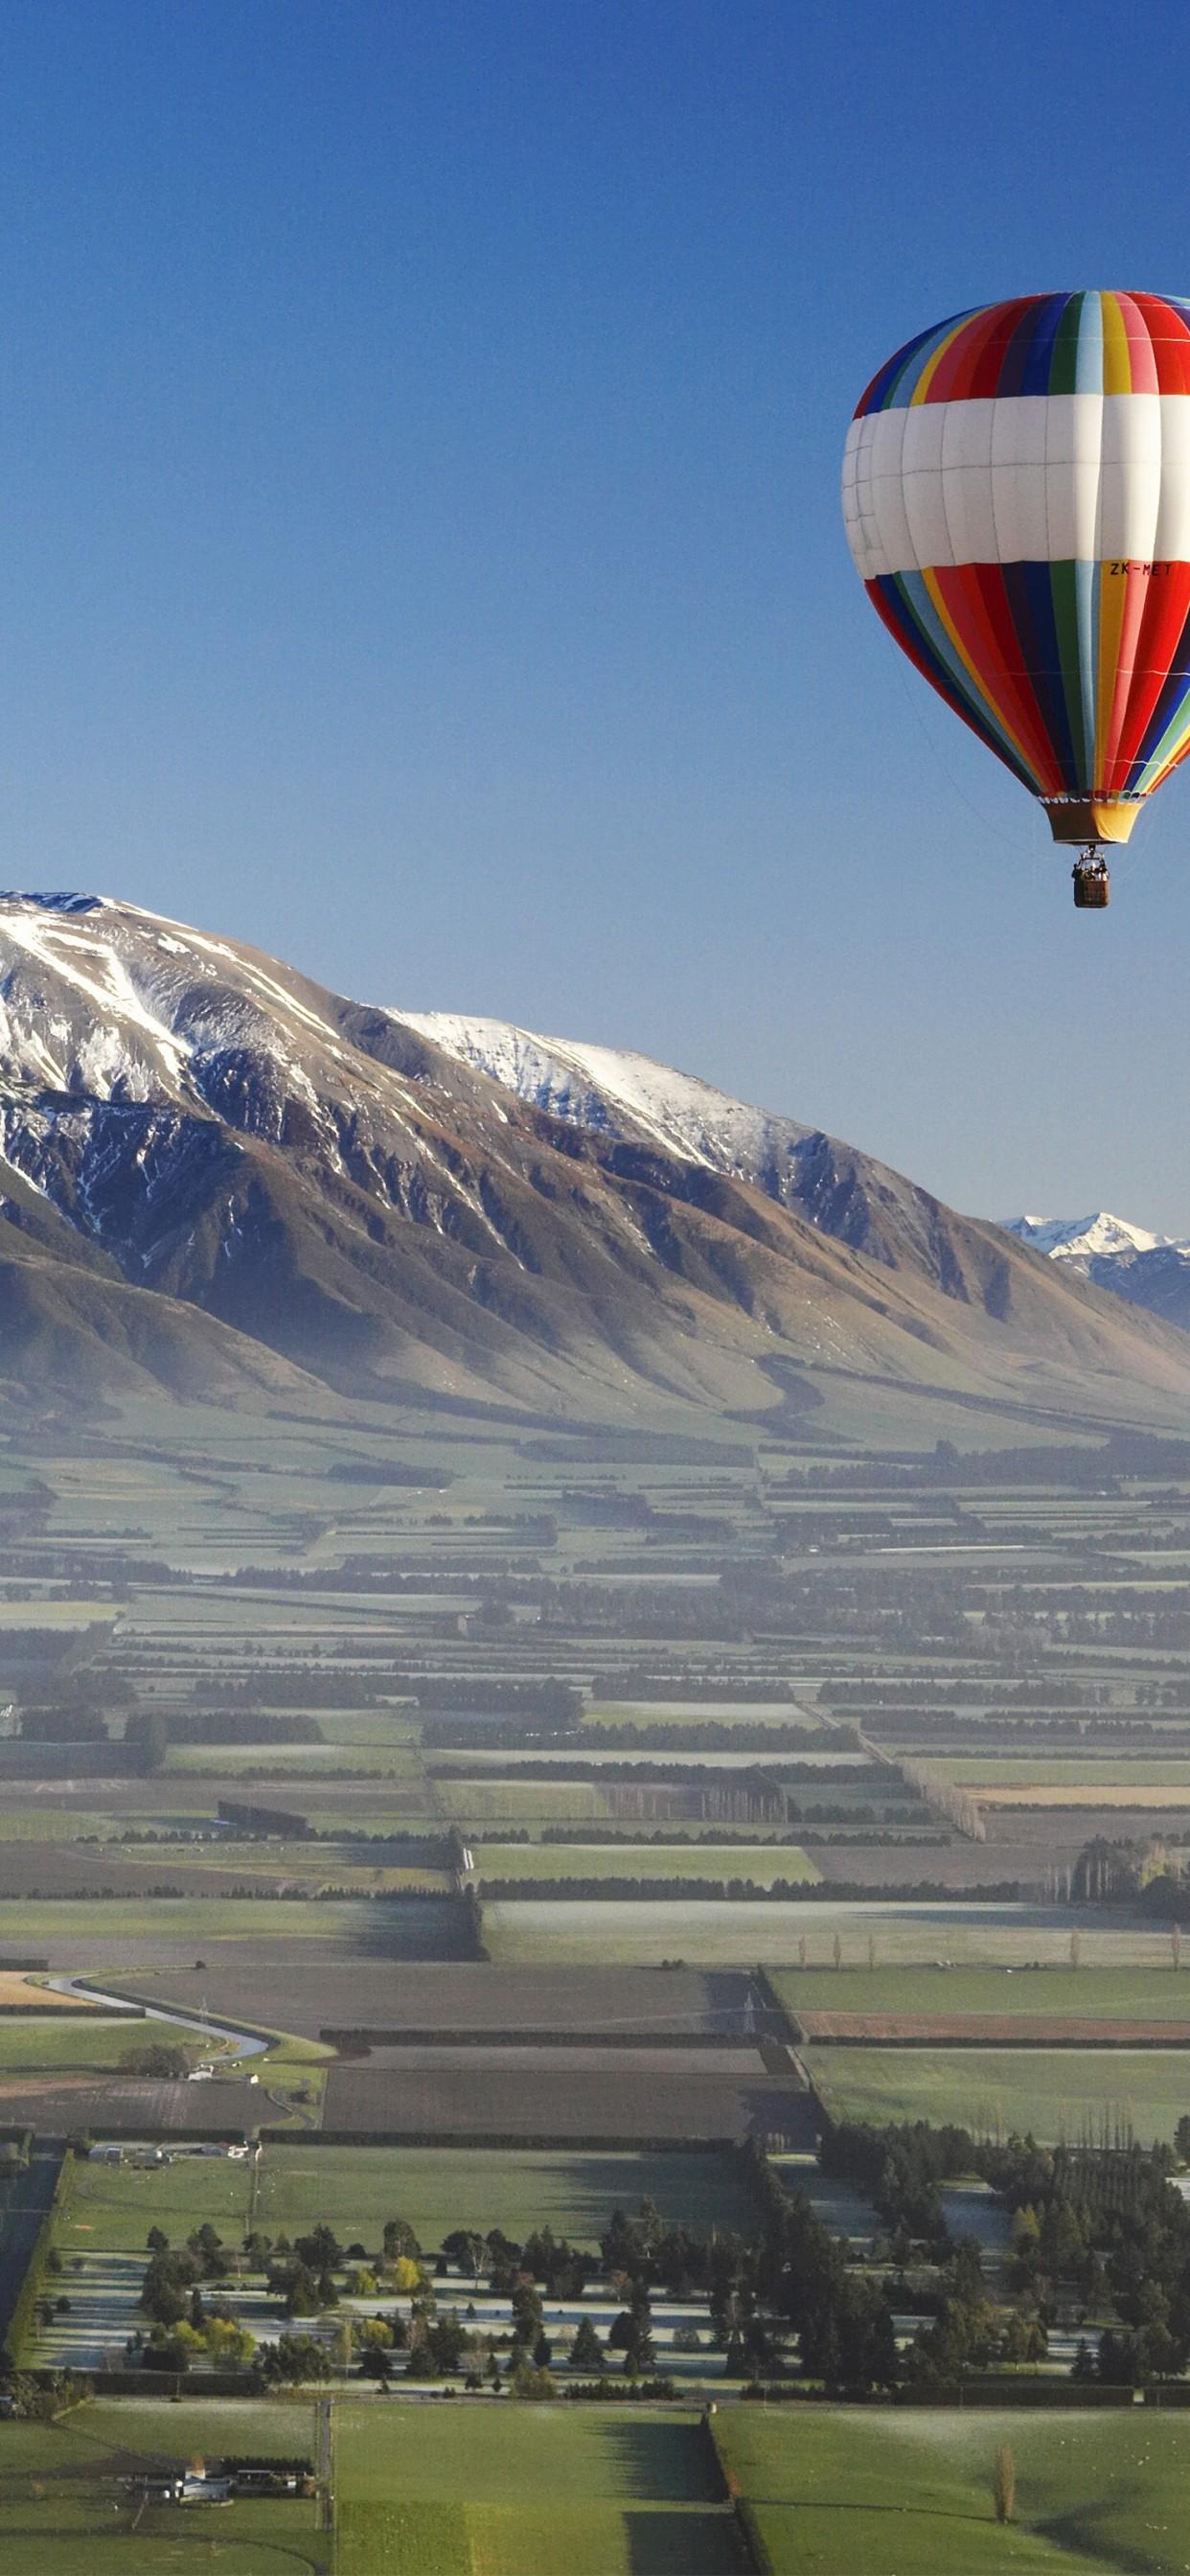 Iphone Xs Max New Zealand Wallpaper - Visiting Places In New Zealand - HD Wallpaper